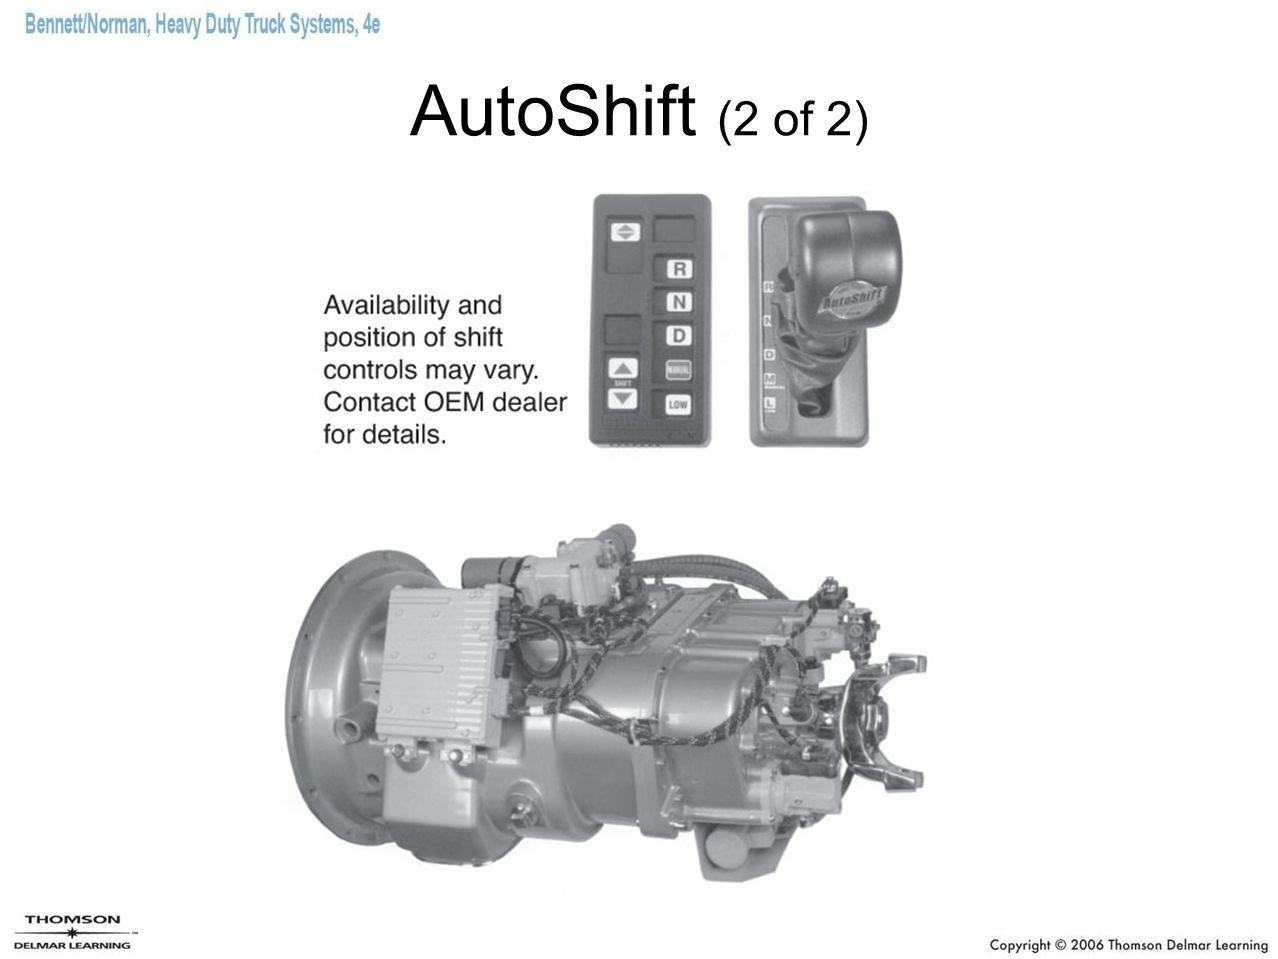 AutoShift (2 of 2)